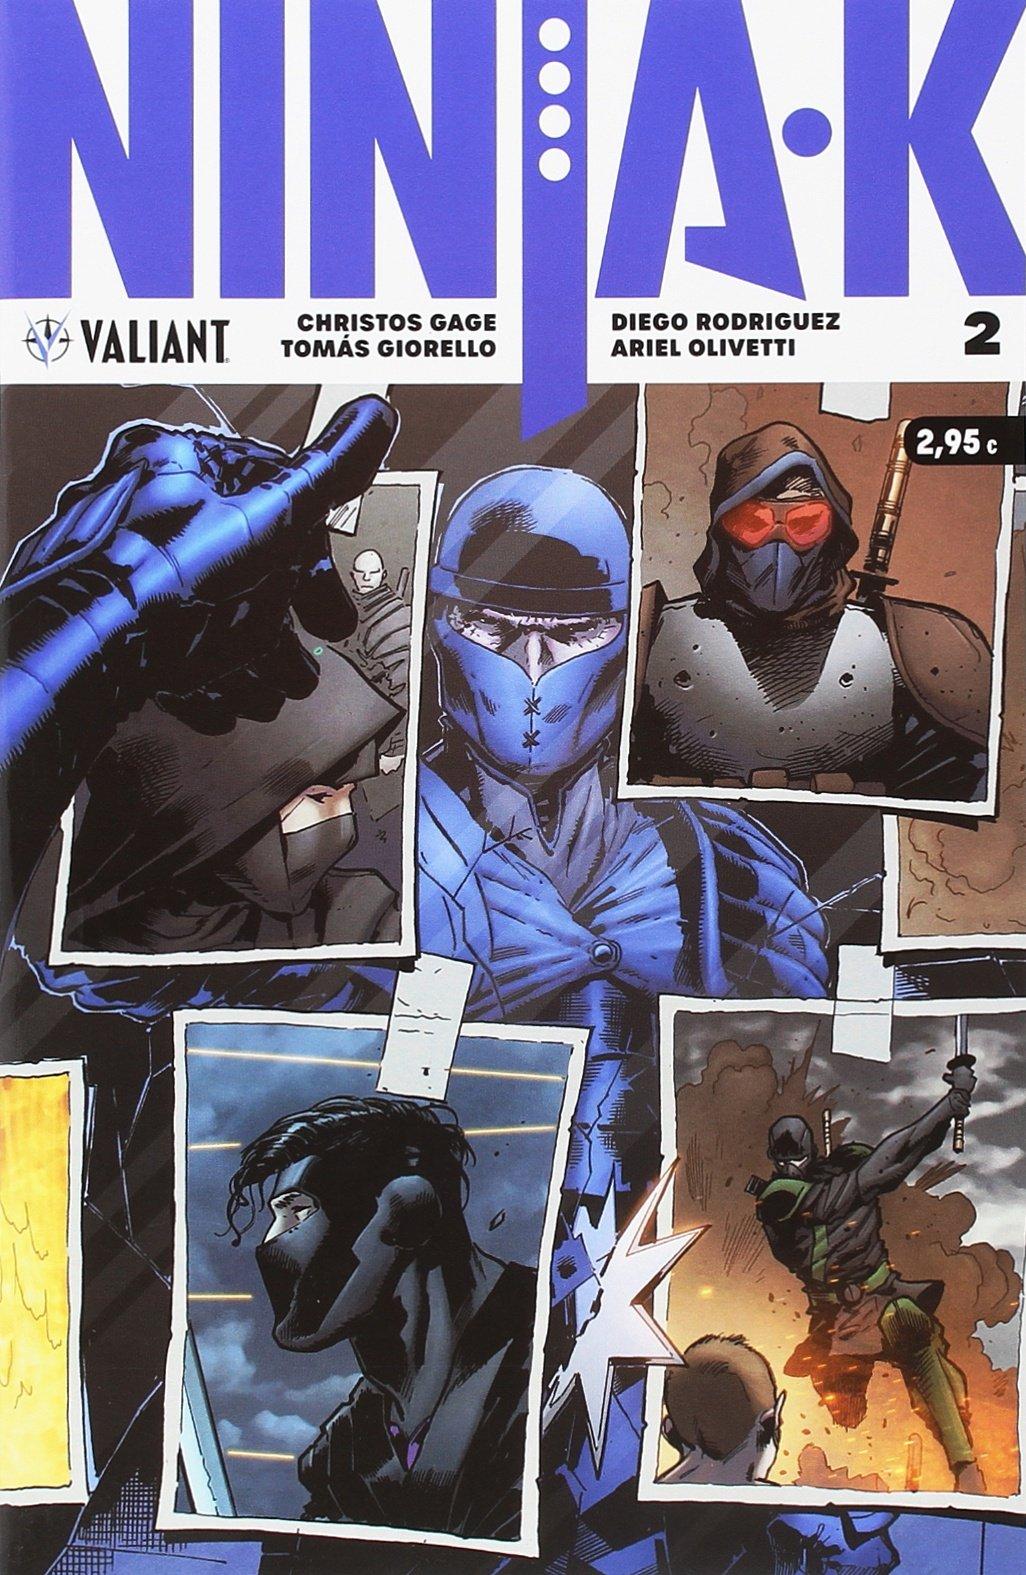 Ninja-K 2 (Valiant - Ninja-k): Amazon.es: Christos Gage: Libros